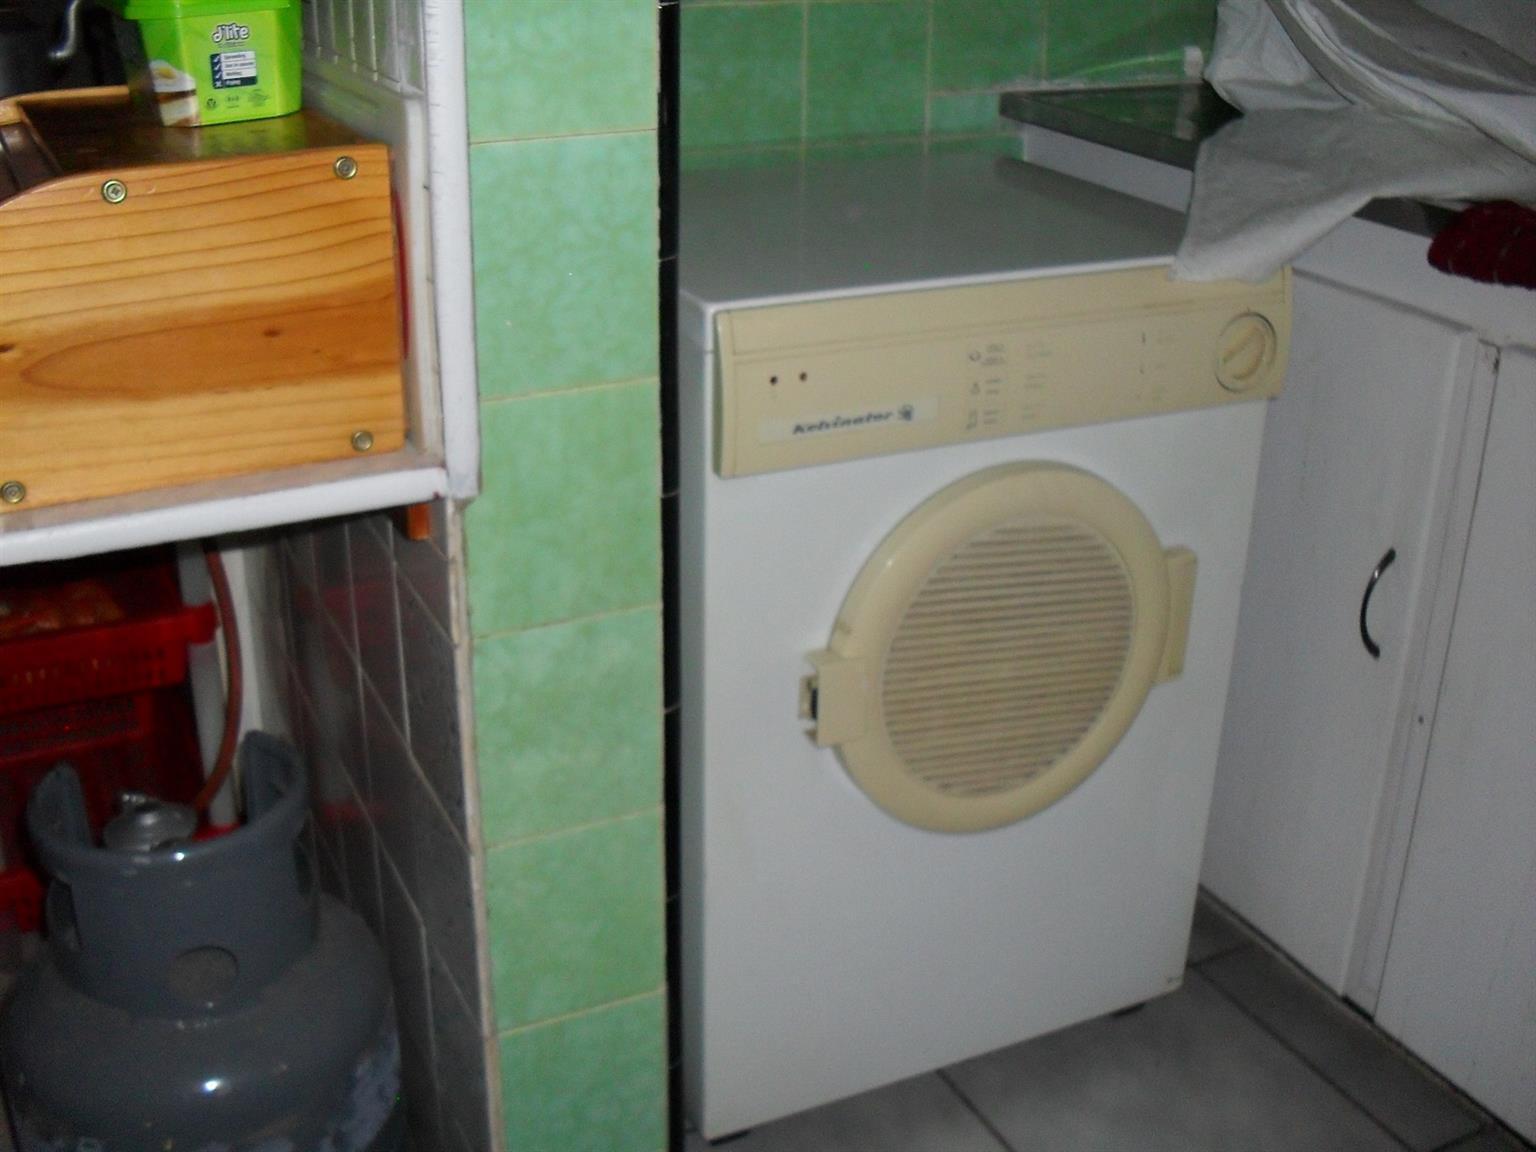 Kelvinator Tumble Dryer  in good working order